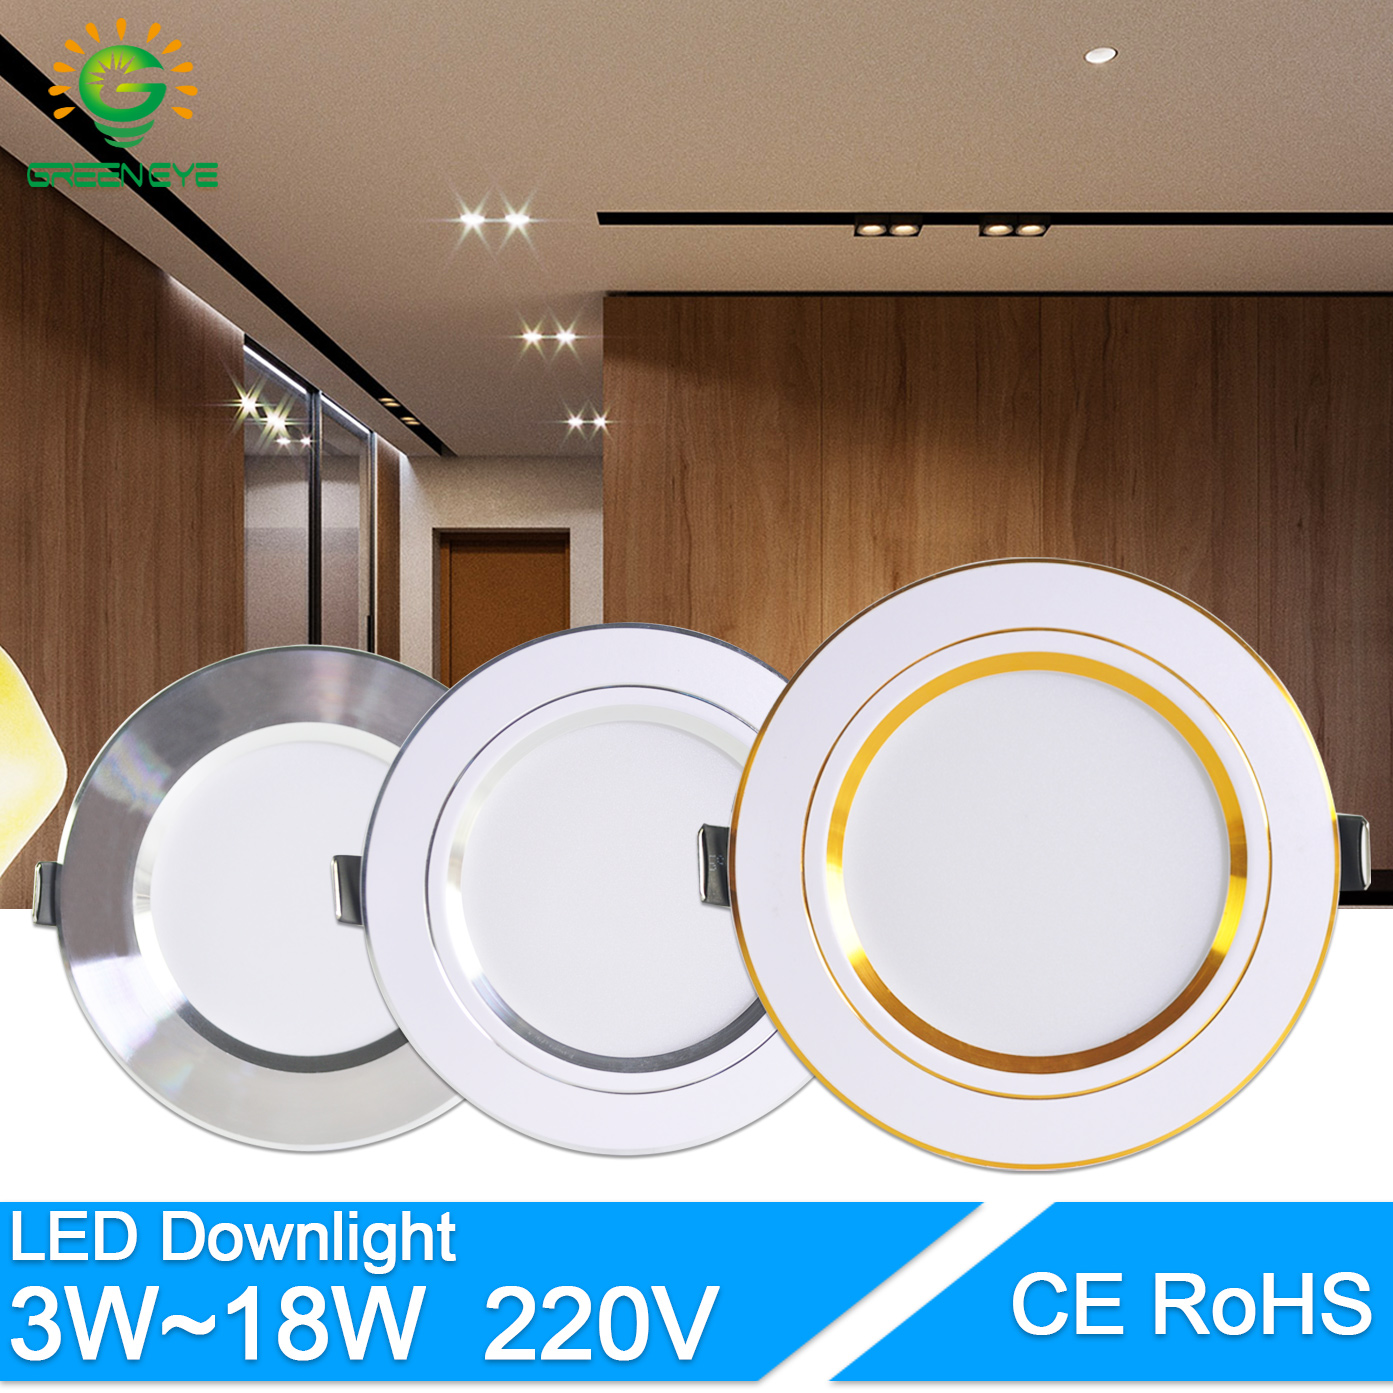 Downlight 3W 5W 9W 12W 15W 18W Spot Led Downlight AC 220V Gold Silver White Ultra Thin Aluminum Round Recessed LED Spot Lighting